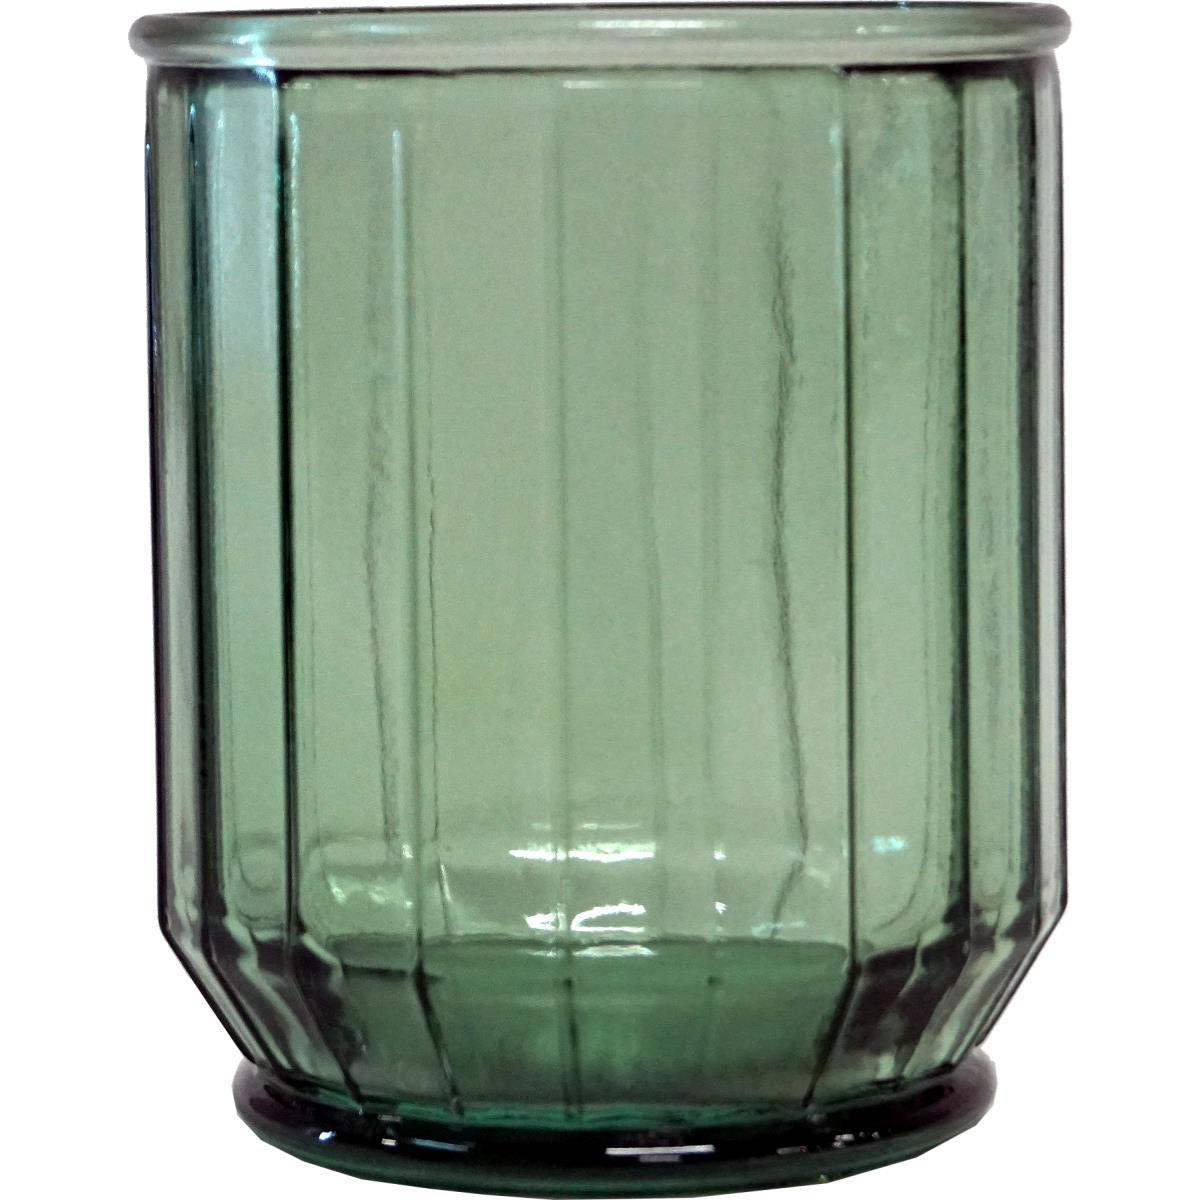 Vase i grønt glass 10x8x8cm